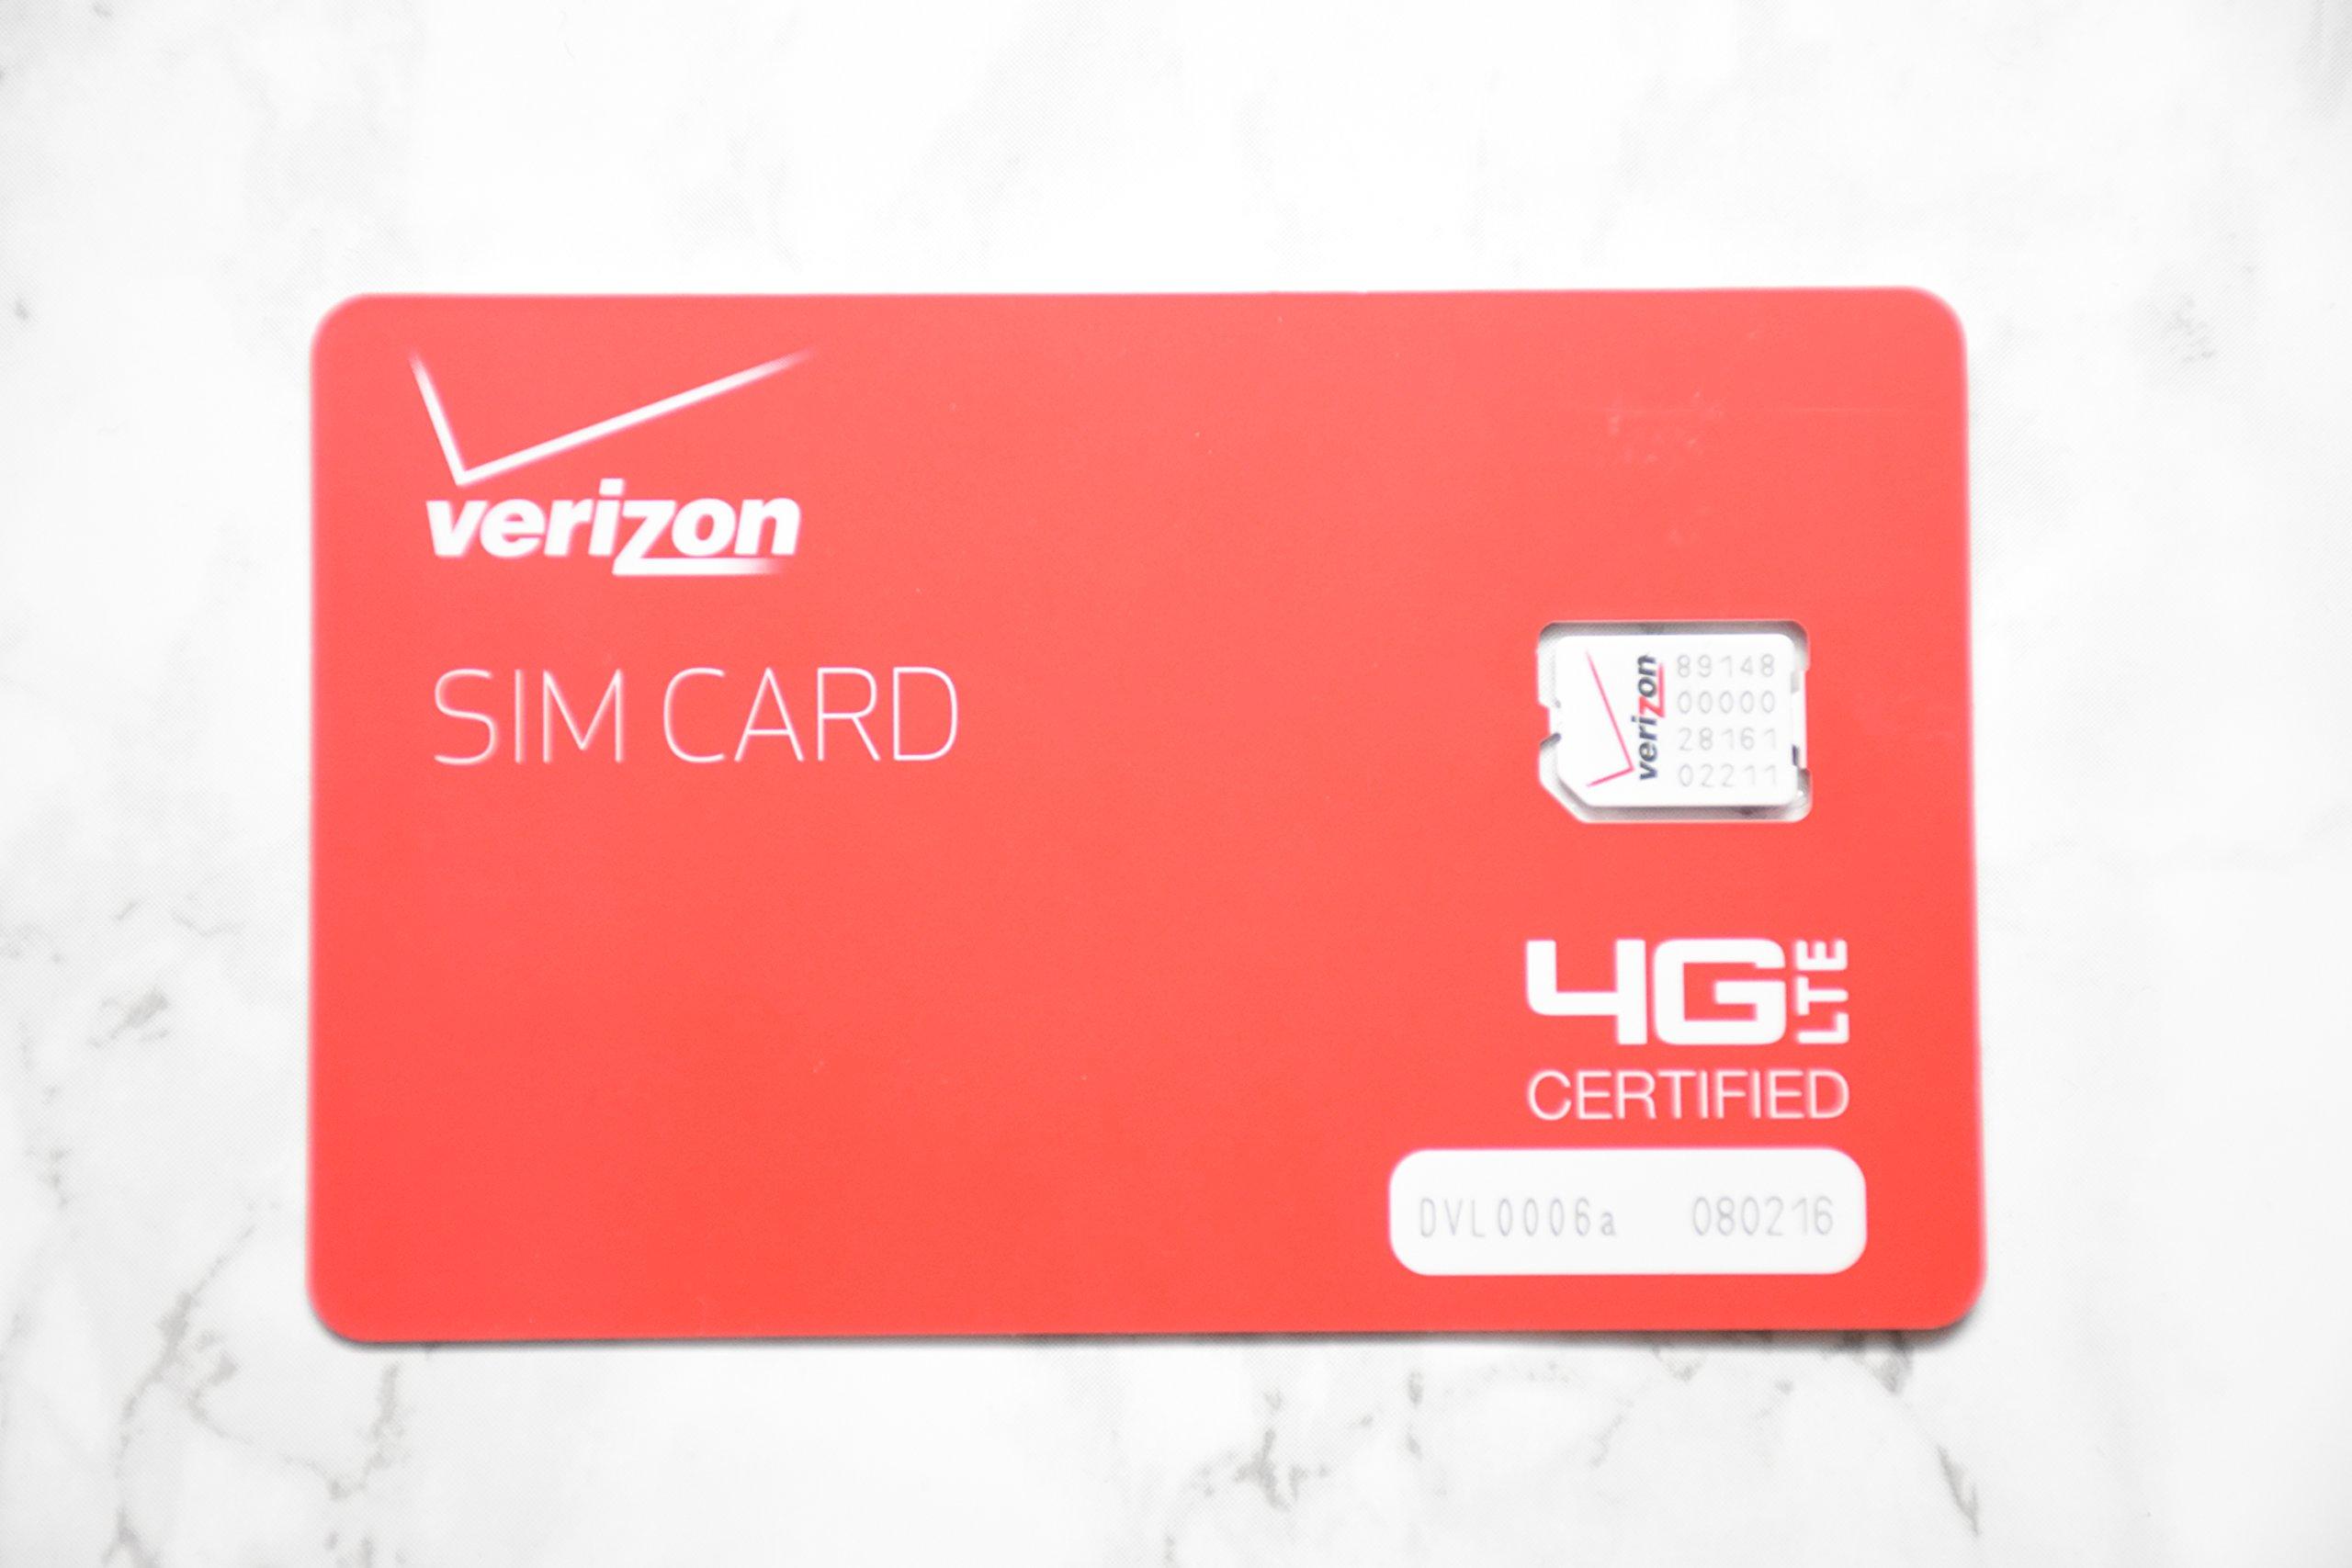 Verizon Wireless prepaid activation kit with $40 plan universal nano size SIM card.